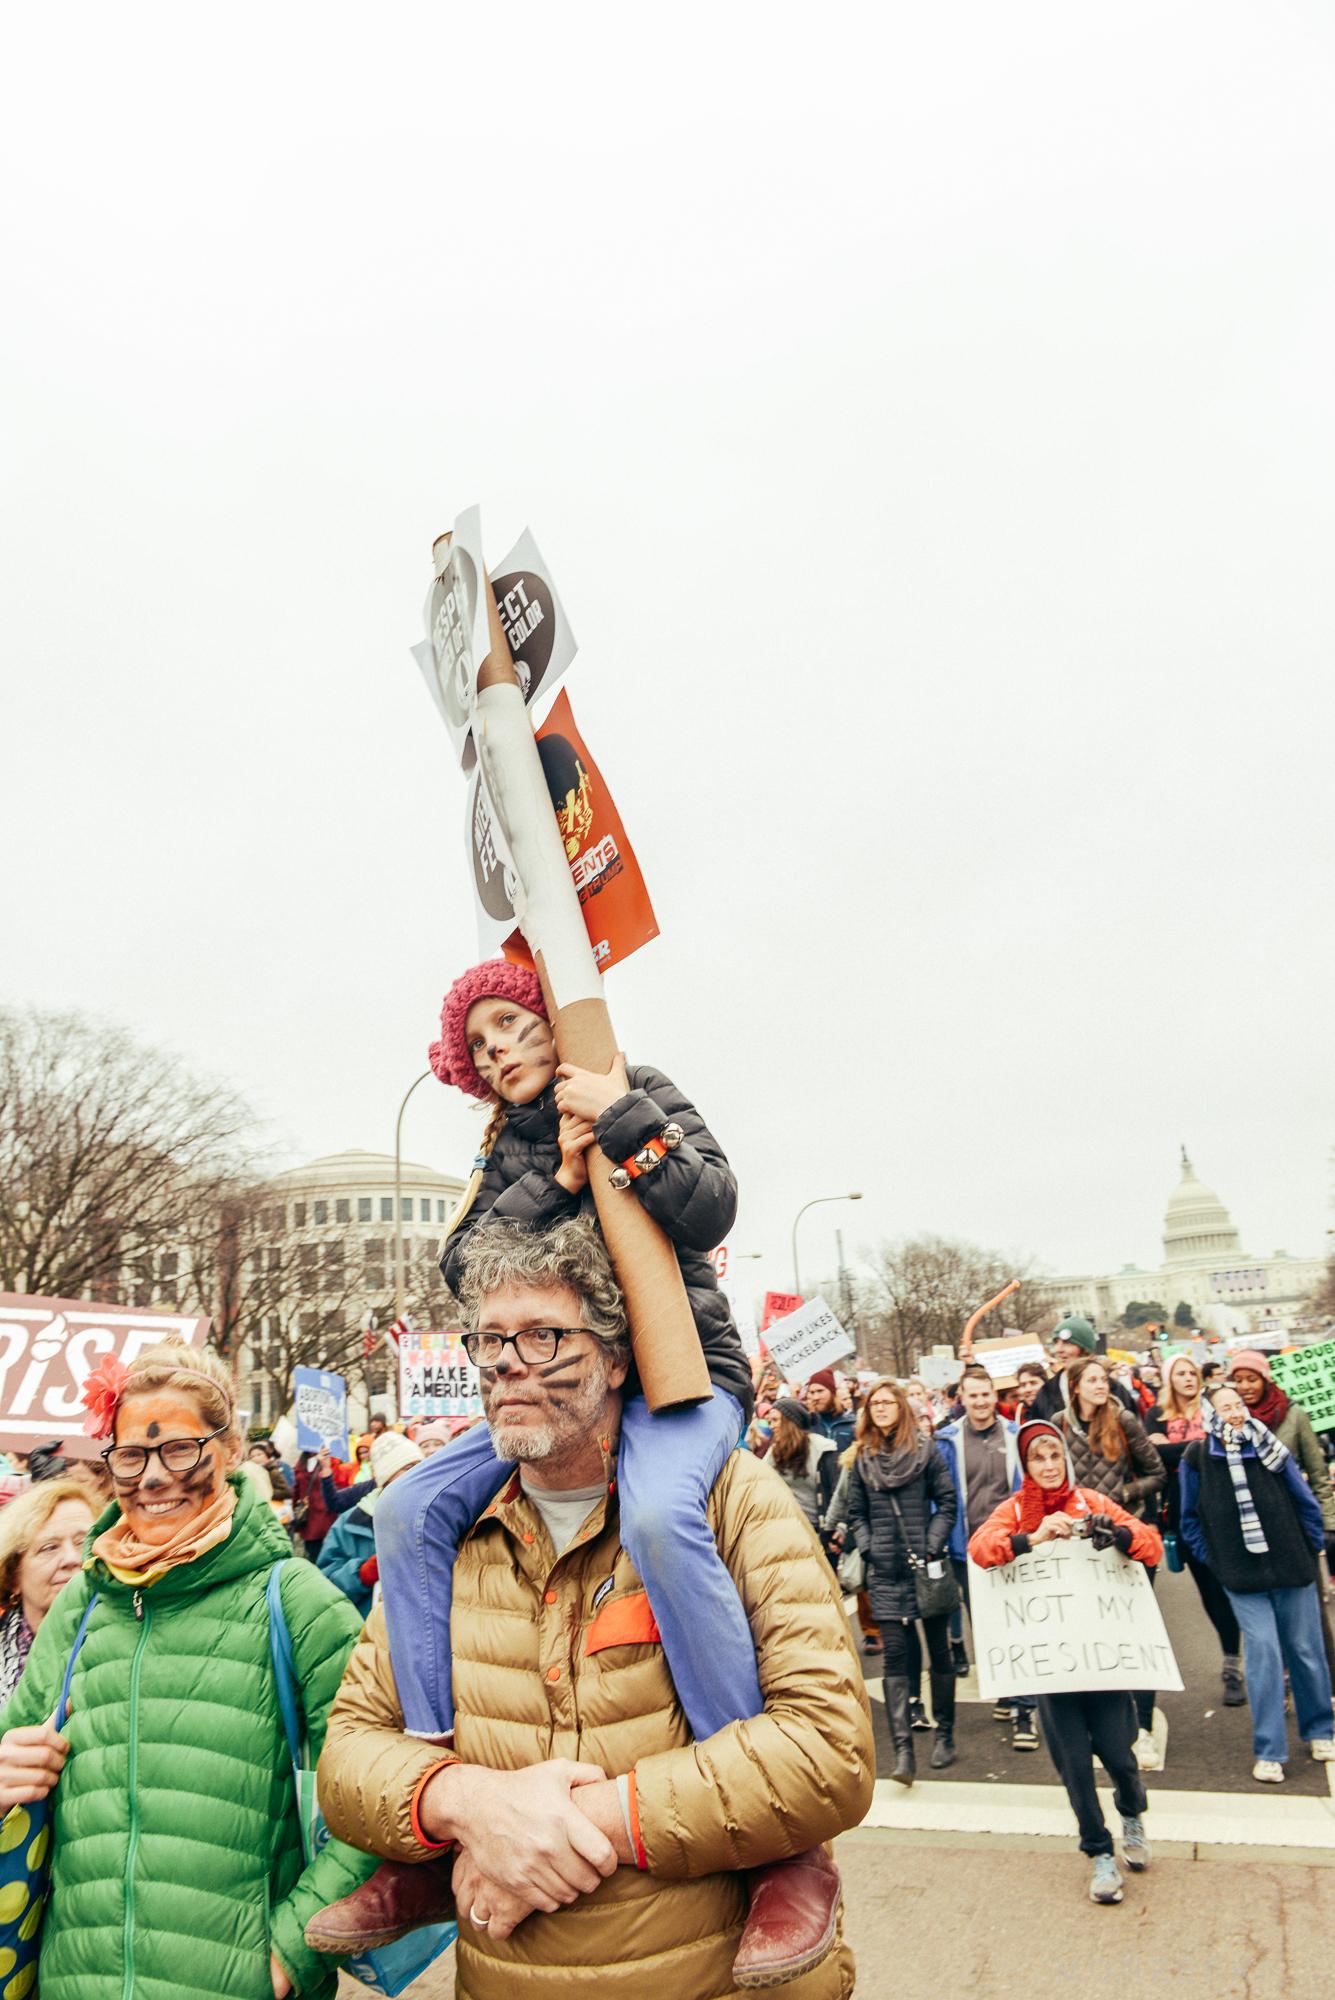 20170121-womens-march-dc-2794.jpg